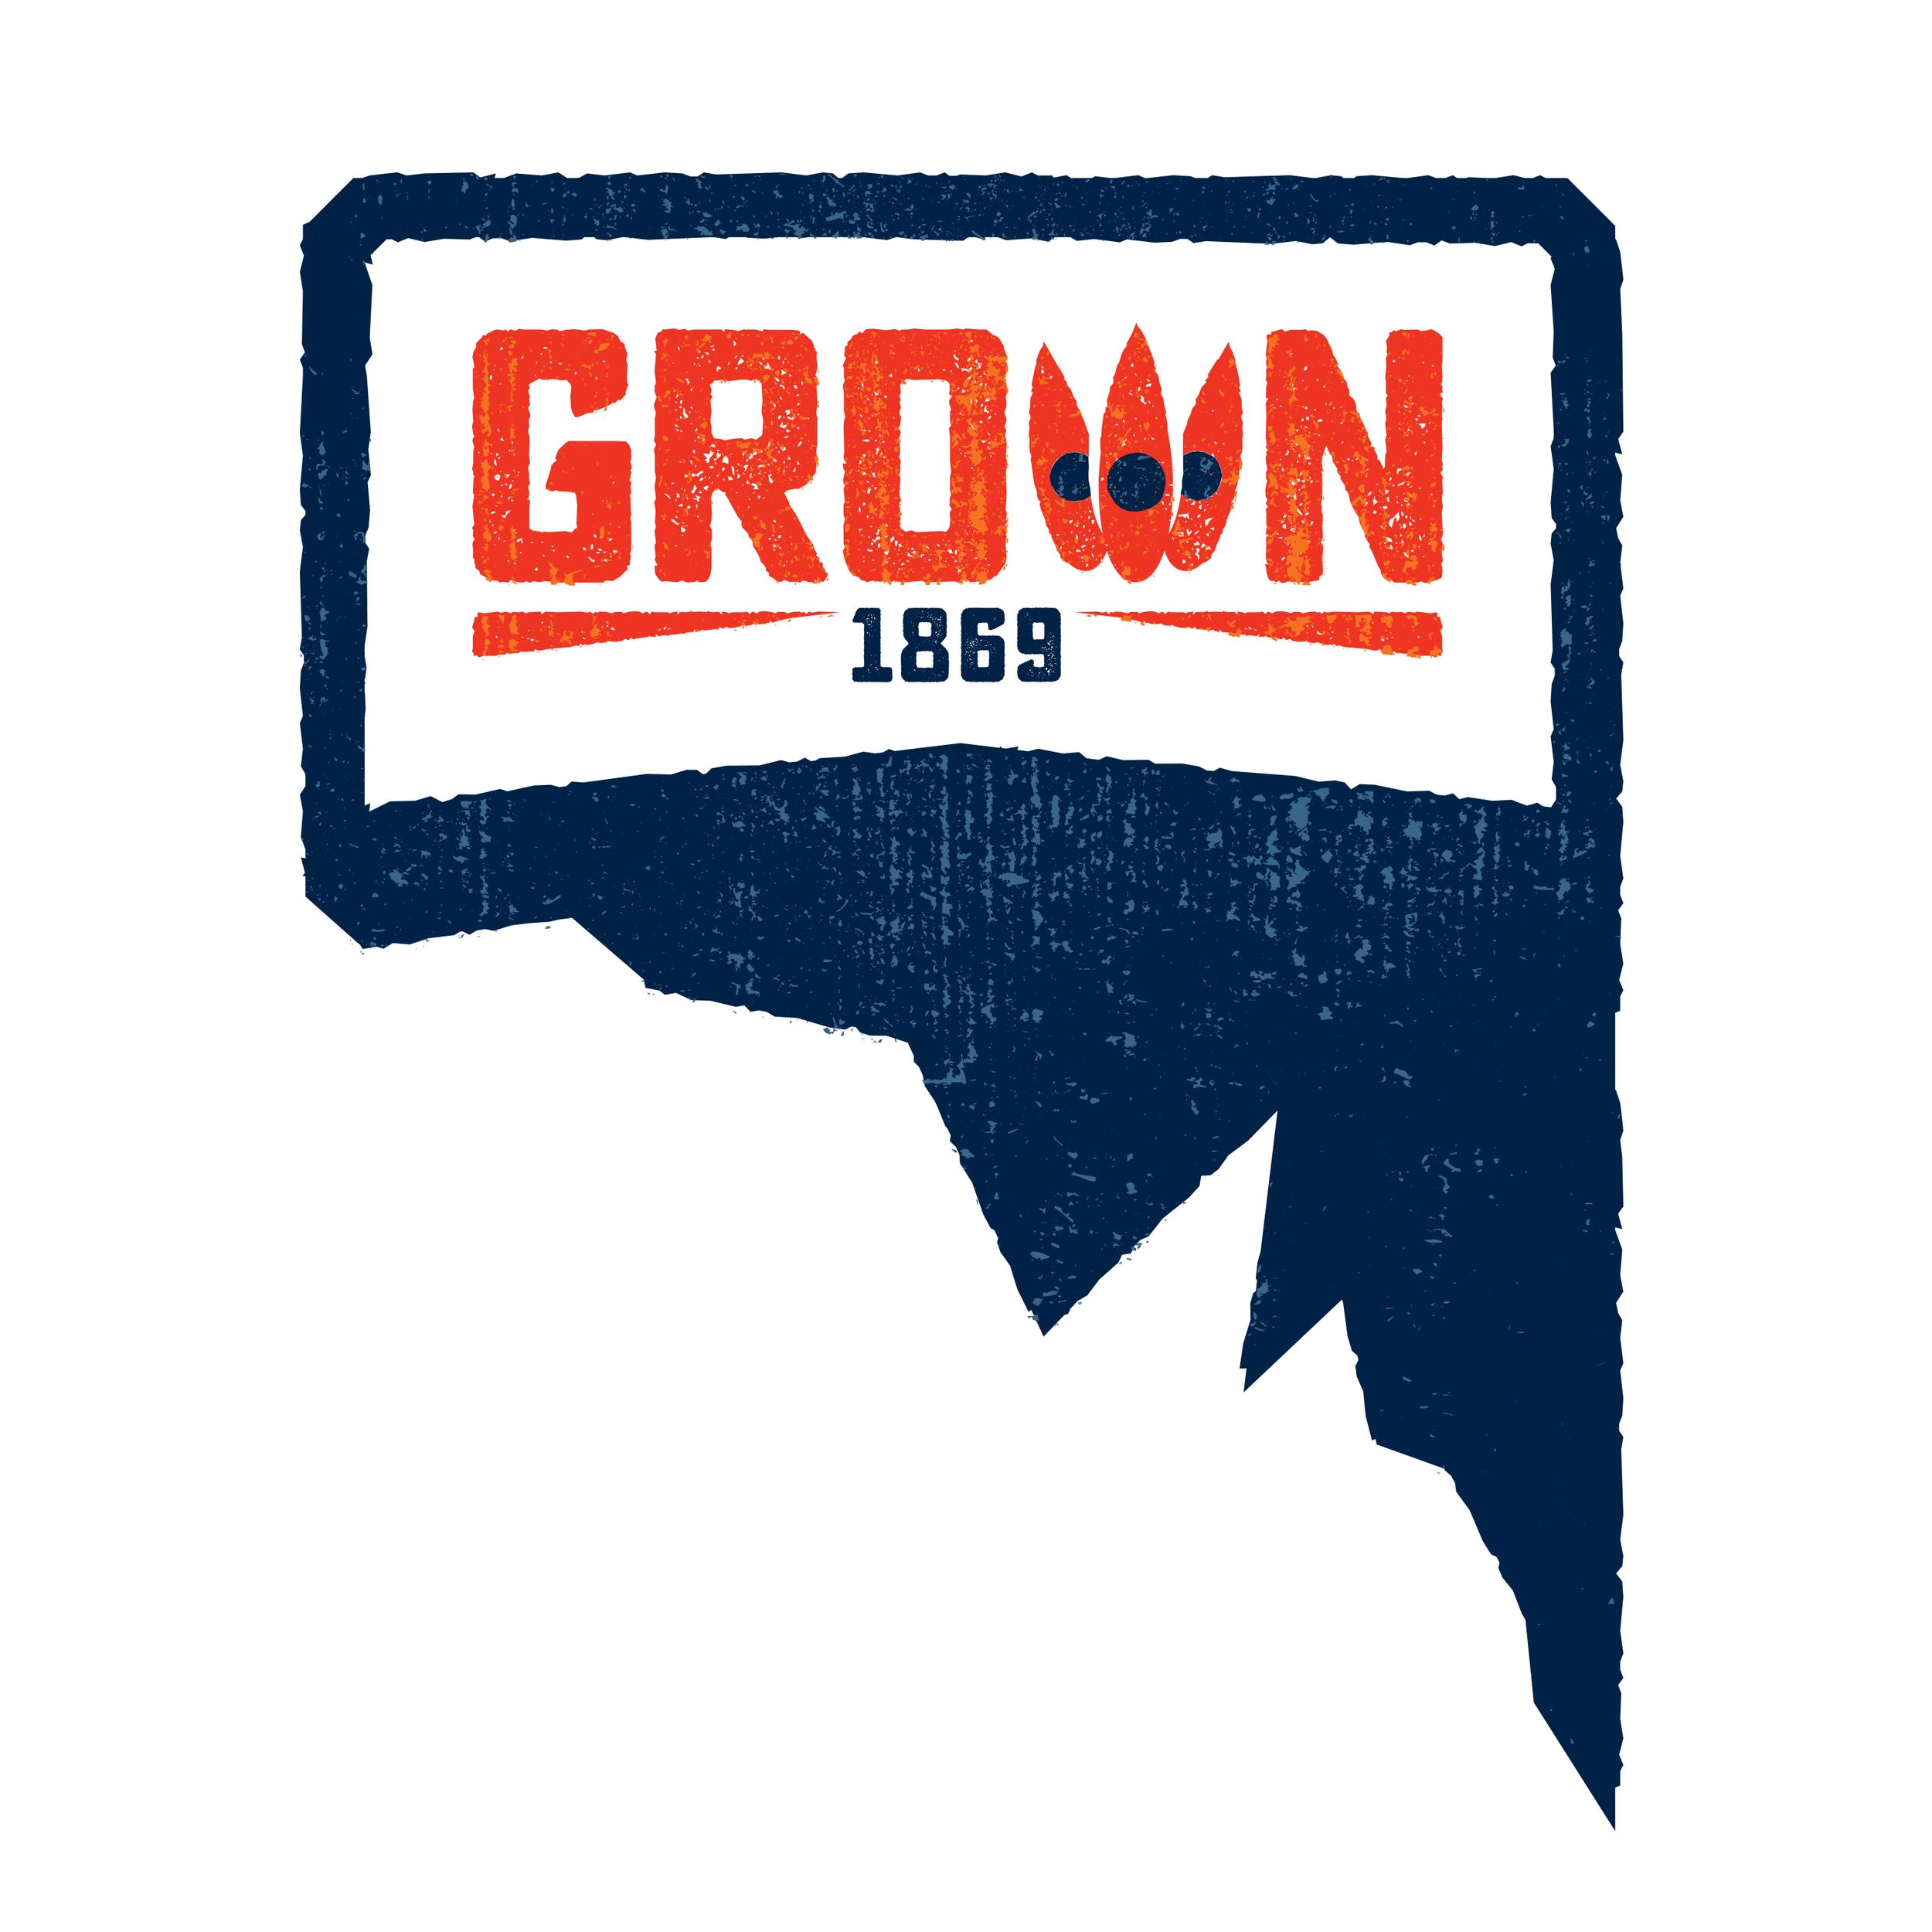 3783 HEYN SA Grown logo_CMYK_FA.png